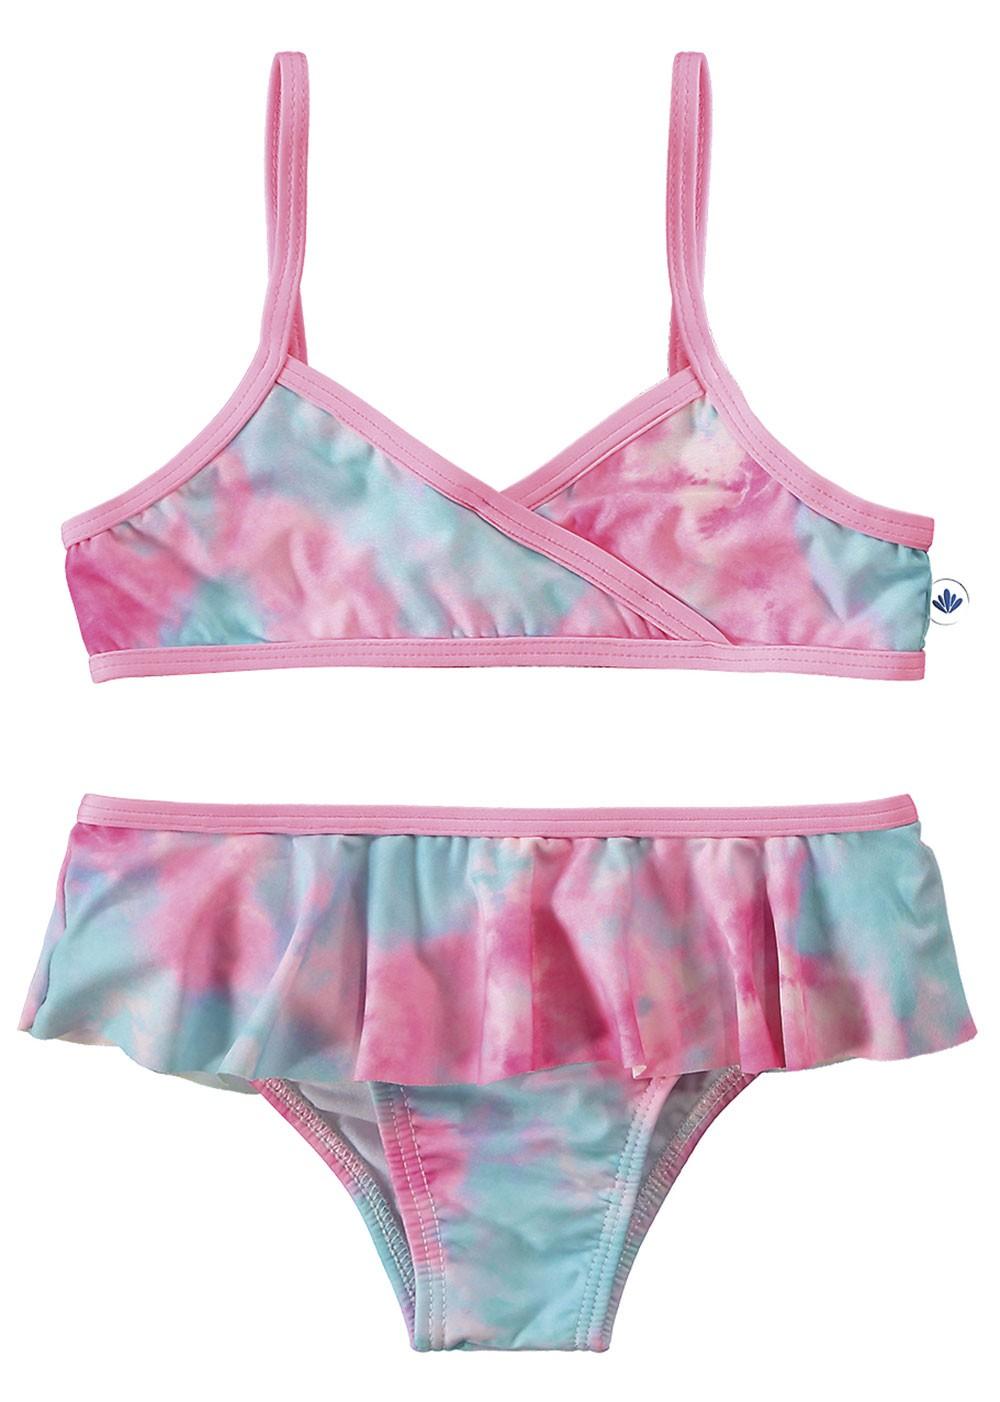 Biquini Infantil Verão Rosa Tie Dye Malwee